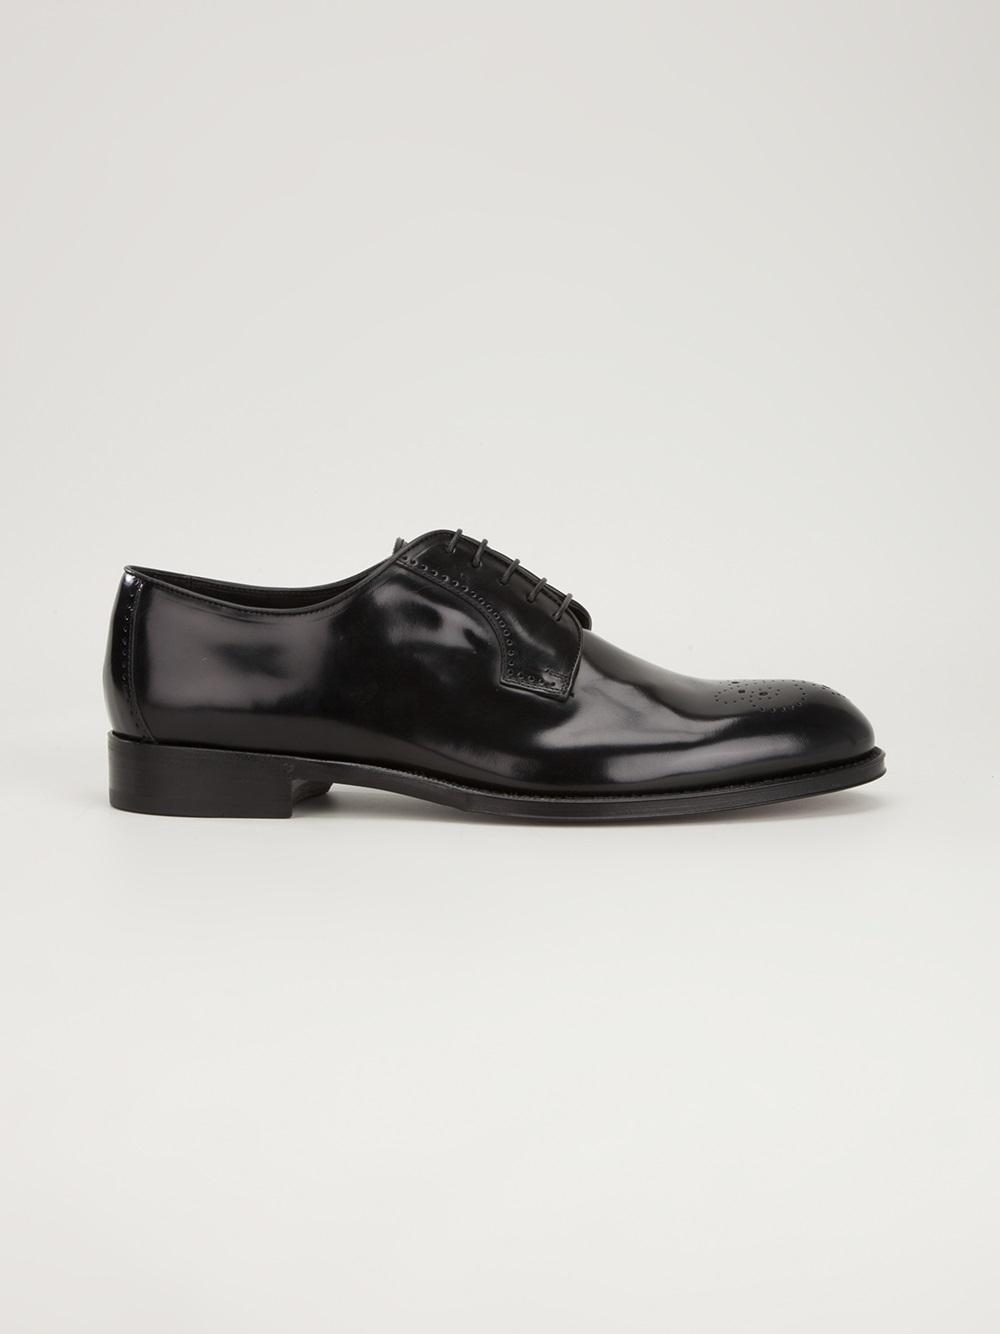 Brioni Lace Up Shoe in Black for Men